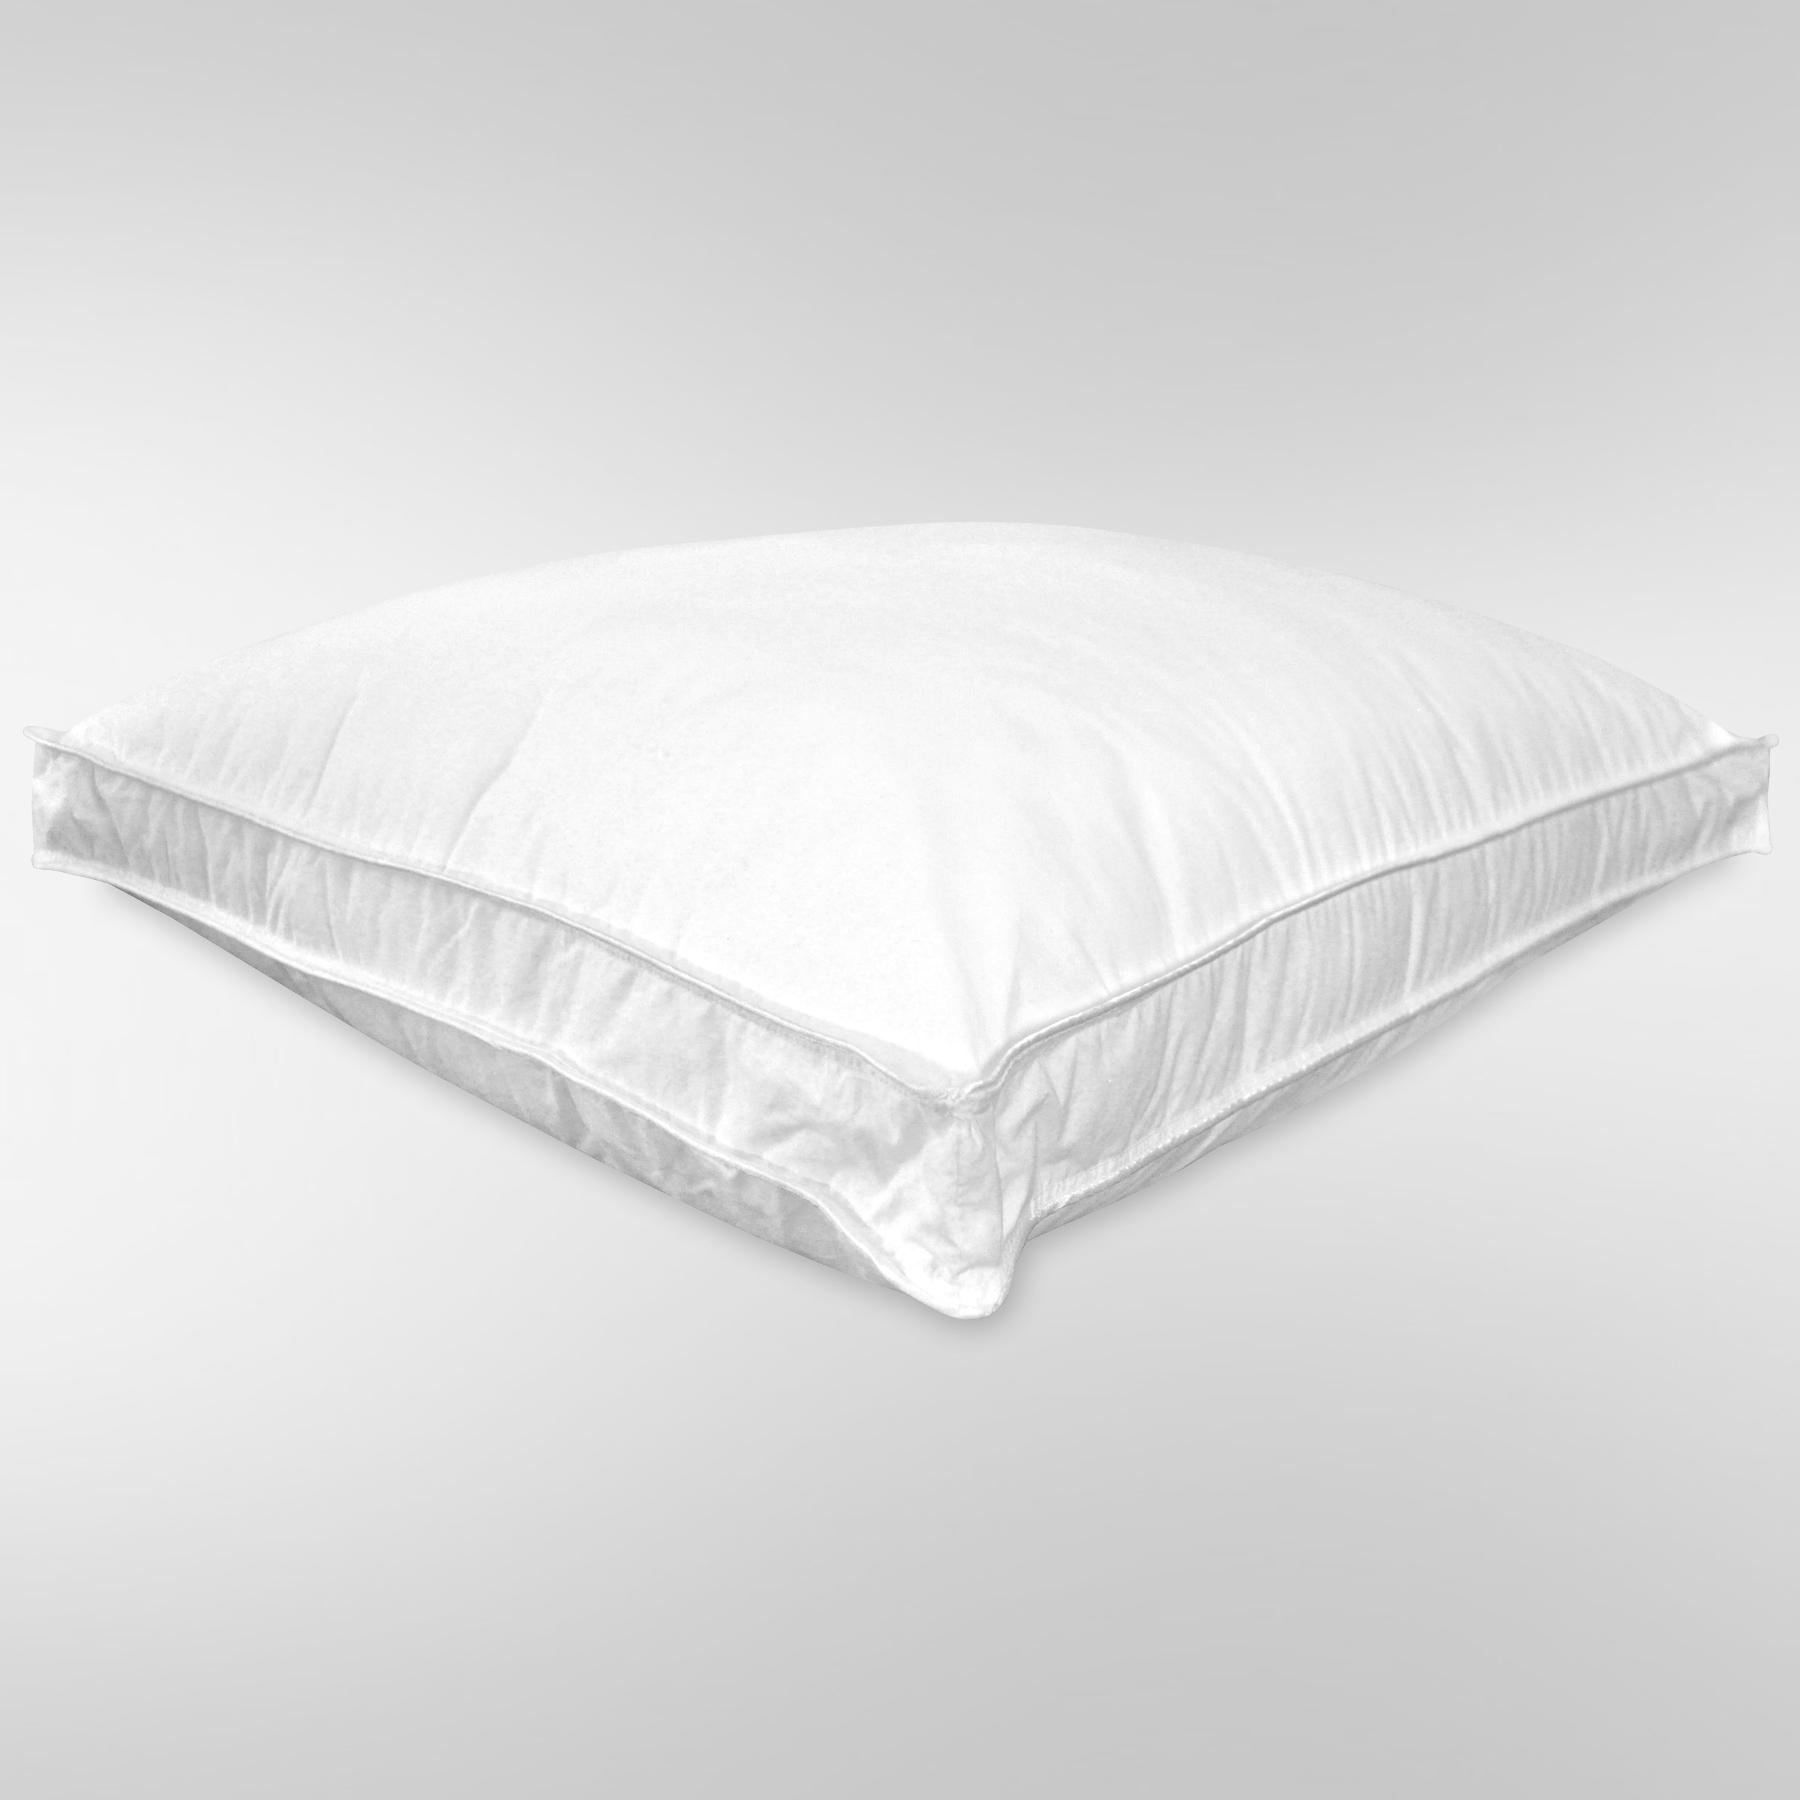 ufd classic down alternative gusset pillow standard back in stock